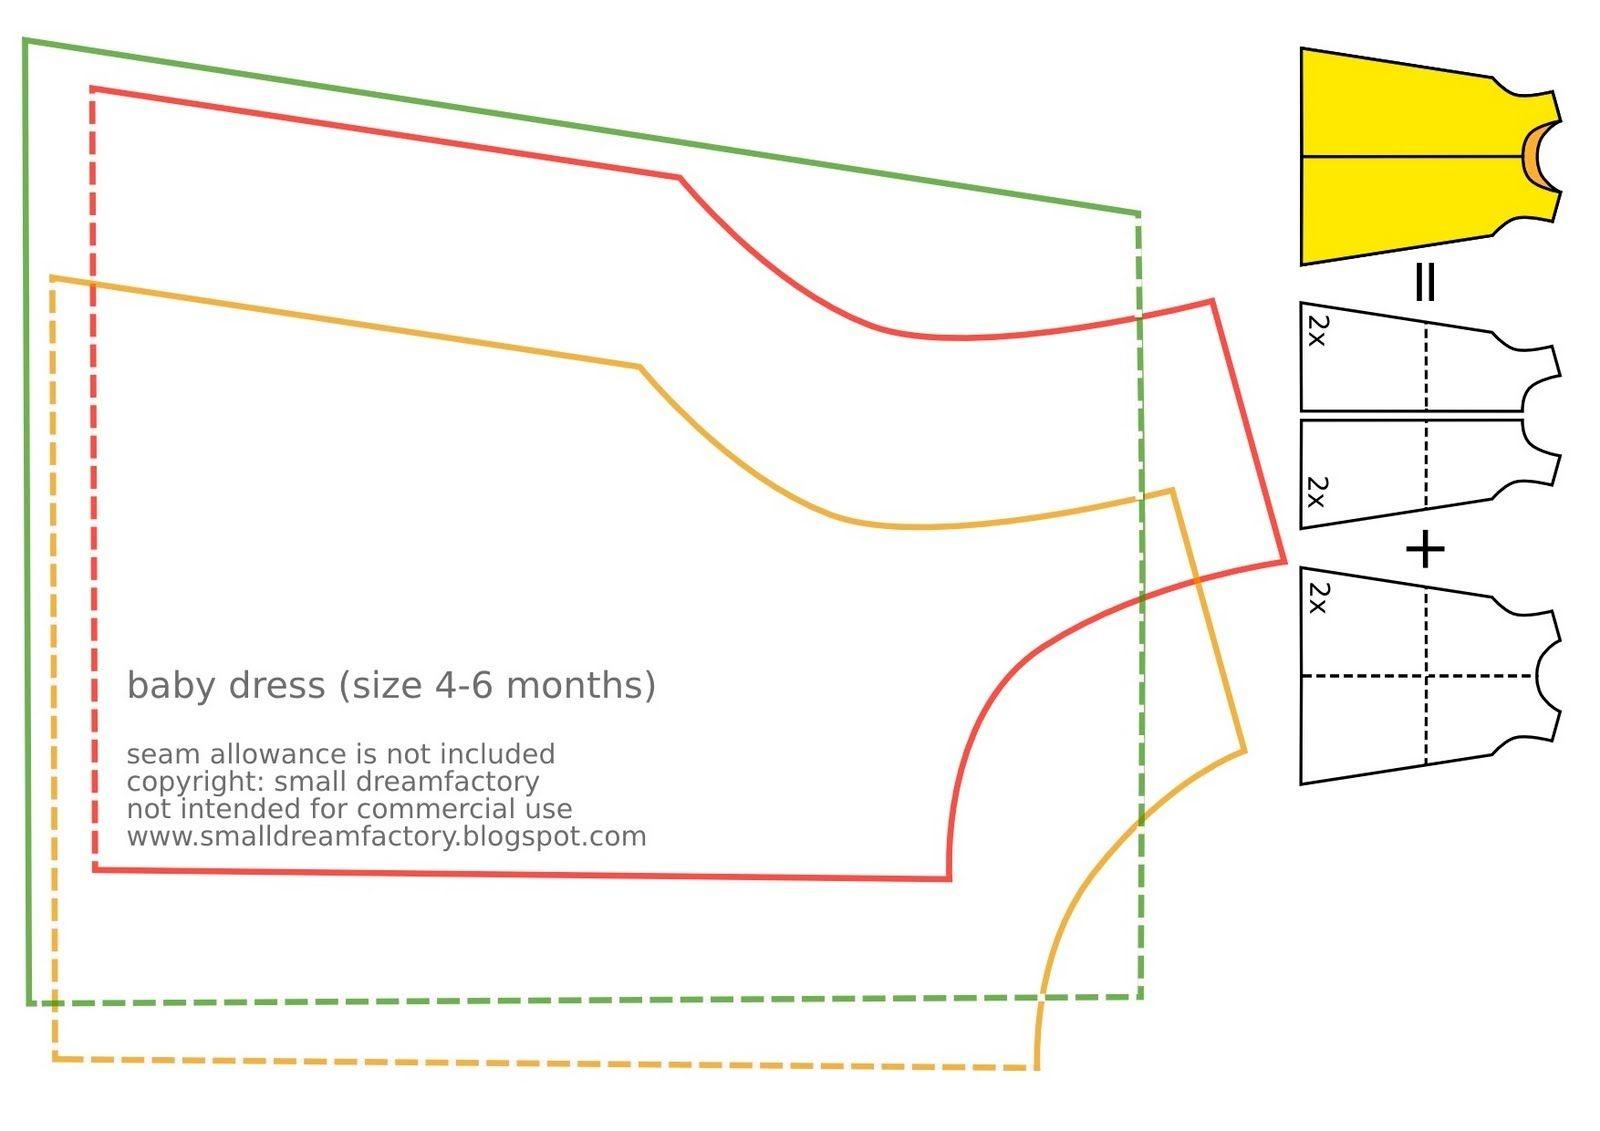 Free Printable Baby Sewing Patterns | Free Sewing Tutorial And - Free Printable Pillowcase Dress Pattern